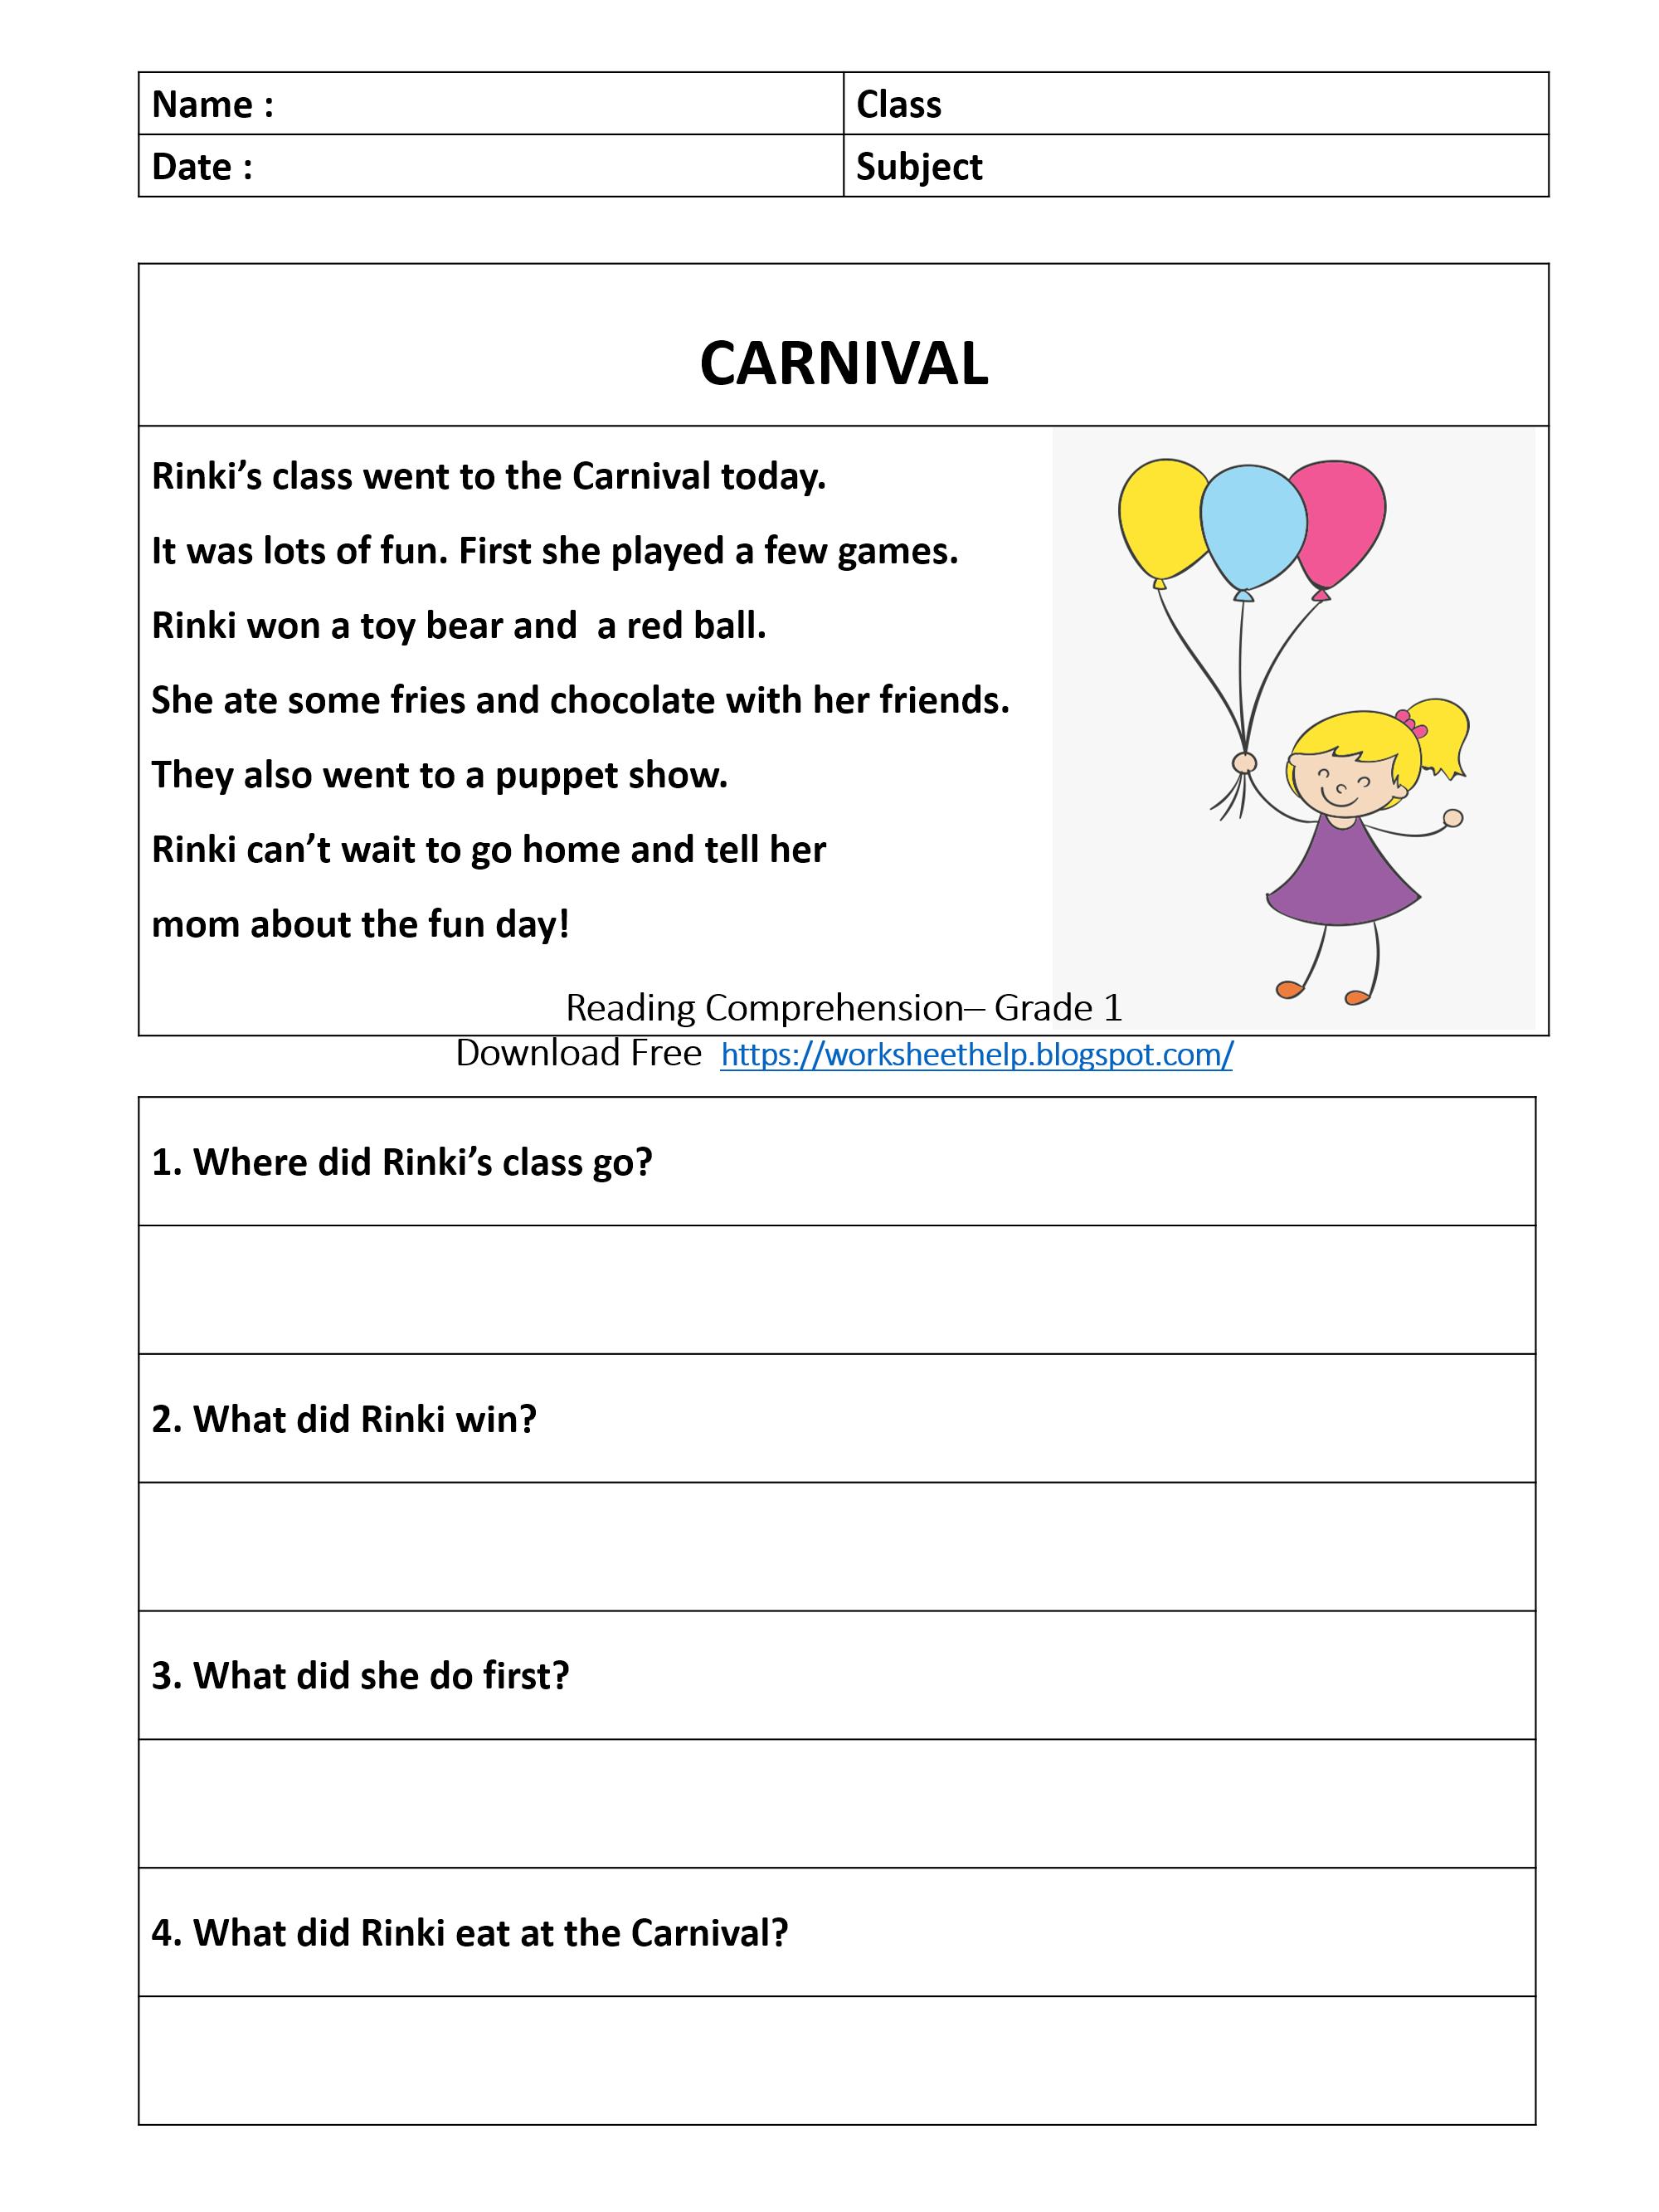 medium resolution of Reading Comprehension Worksheet - Grade 1 - Carnival   Comprehension  worksheets